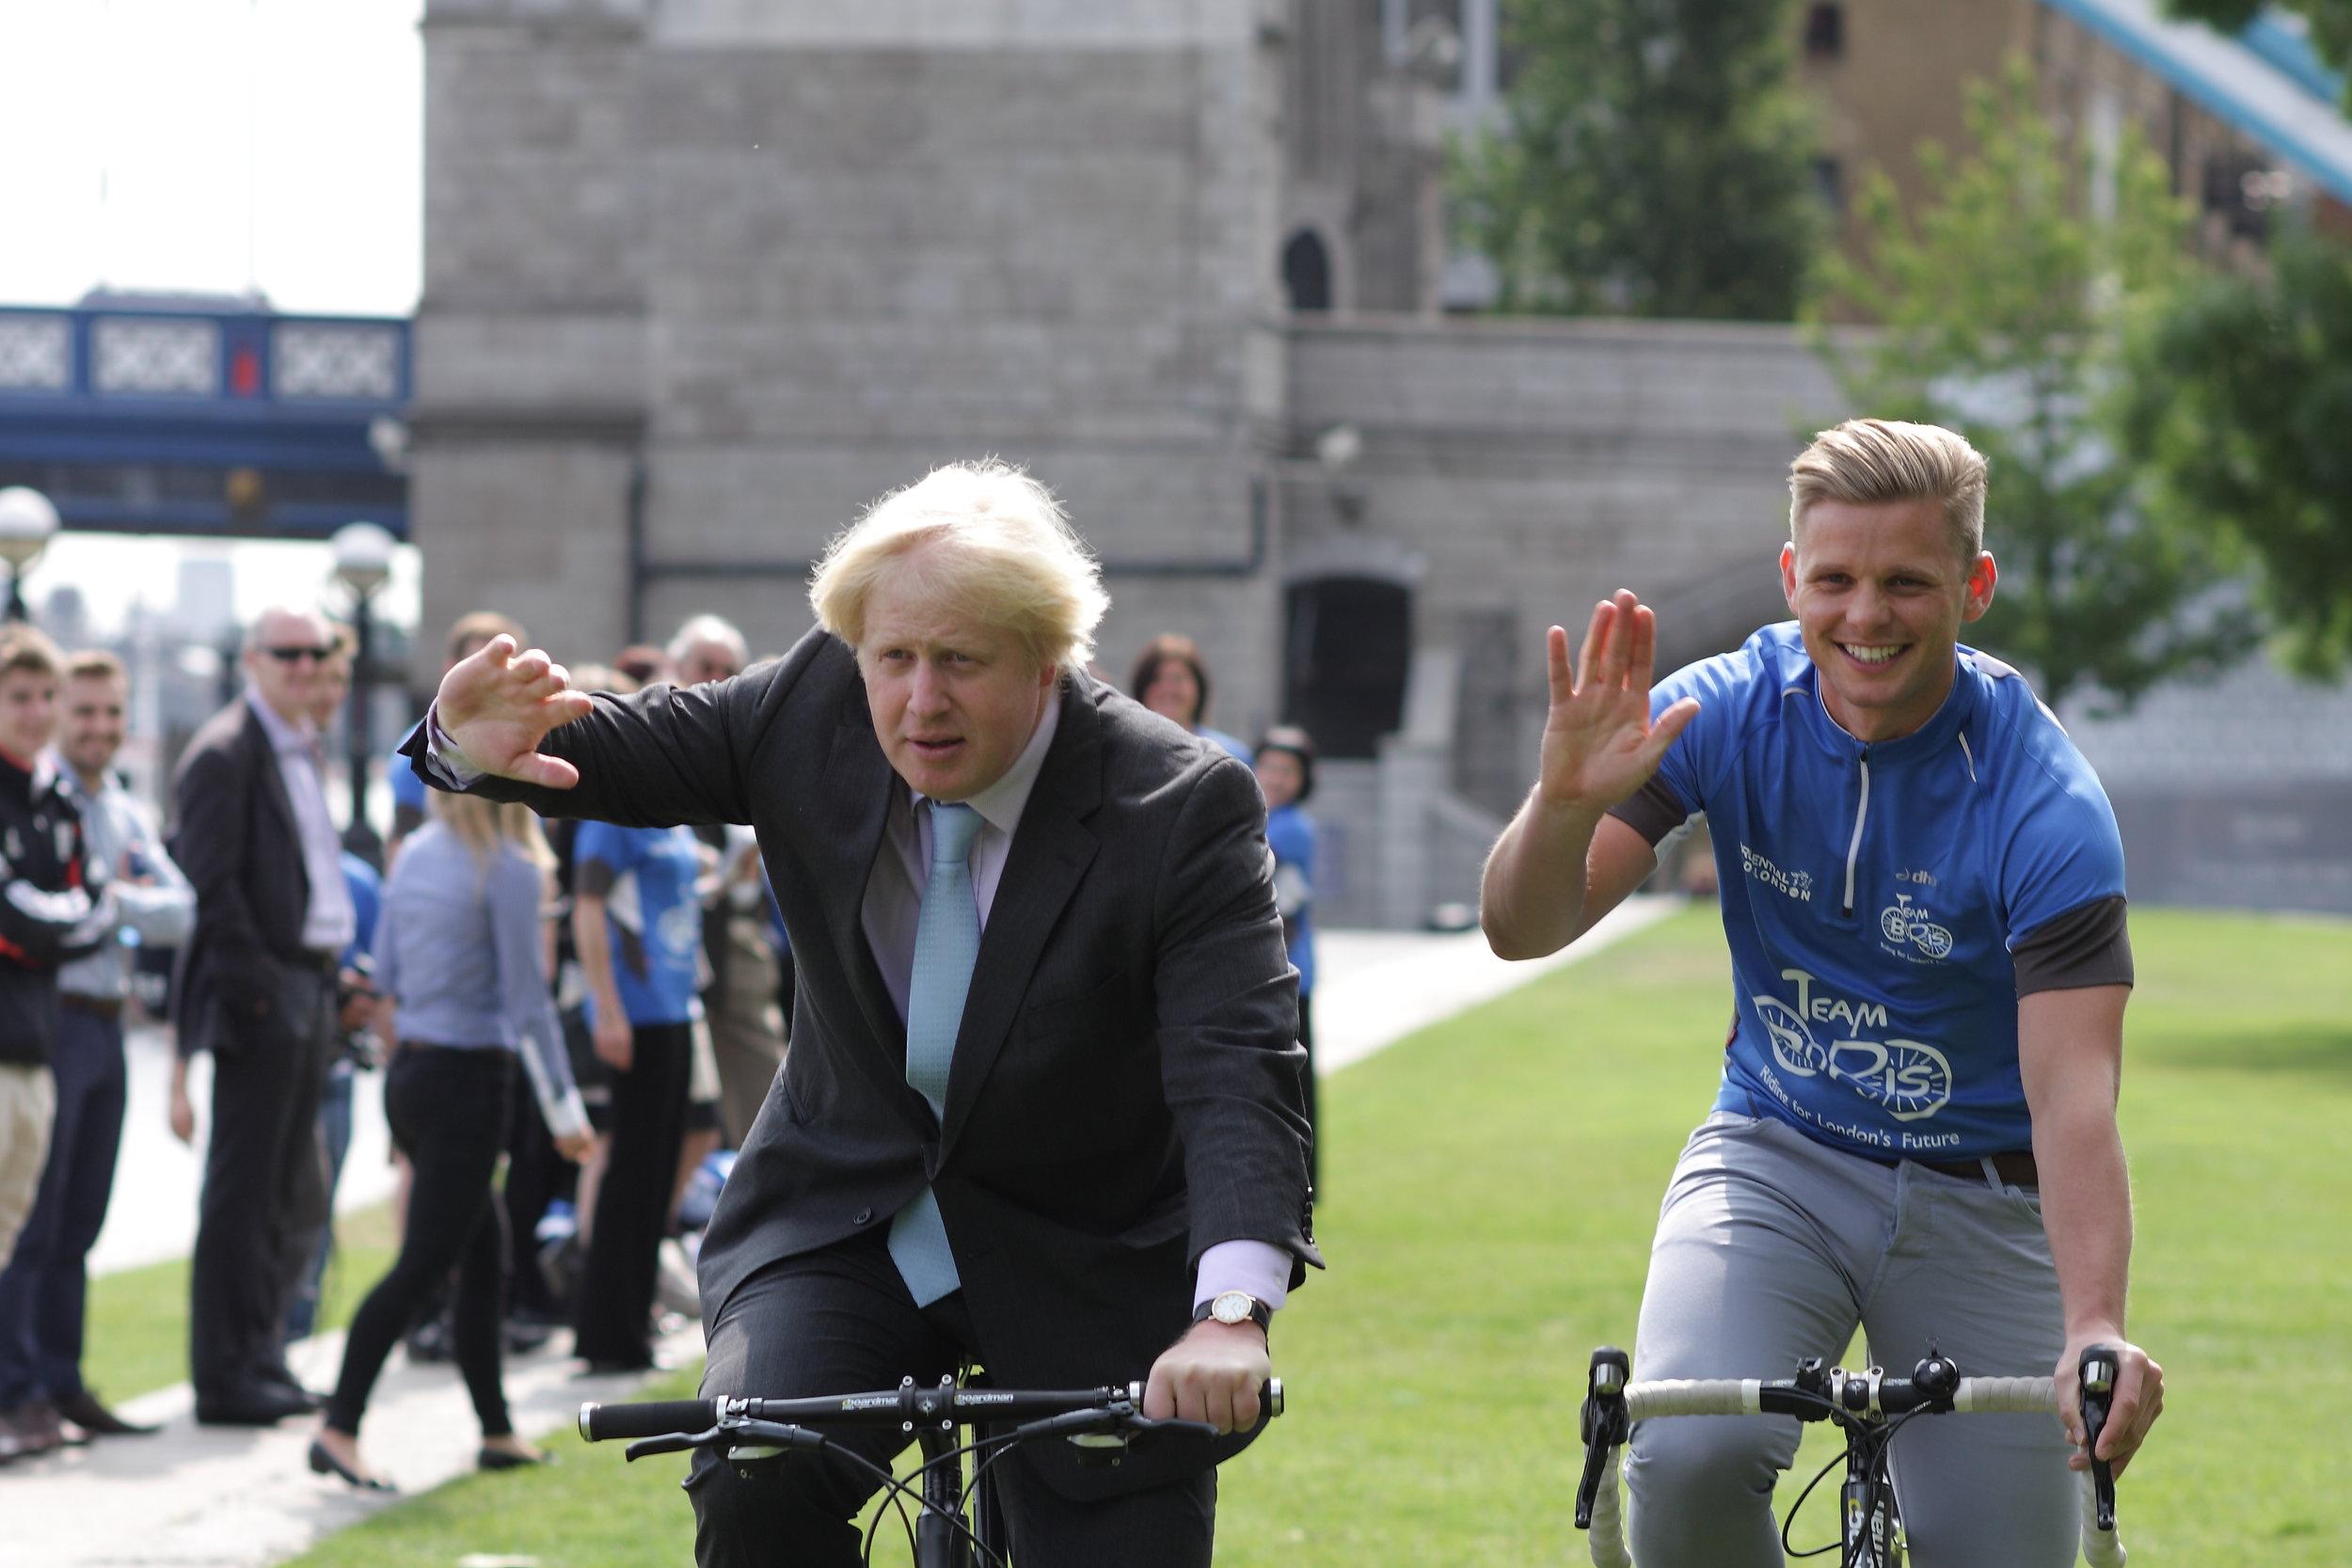 Boris Johnson and Jeff Brazier in training for Team Boris (002).jpg